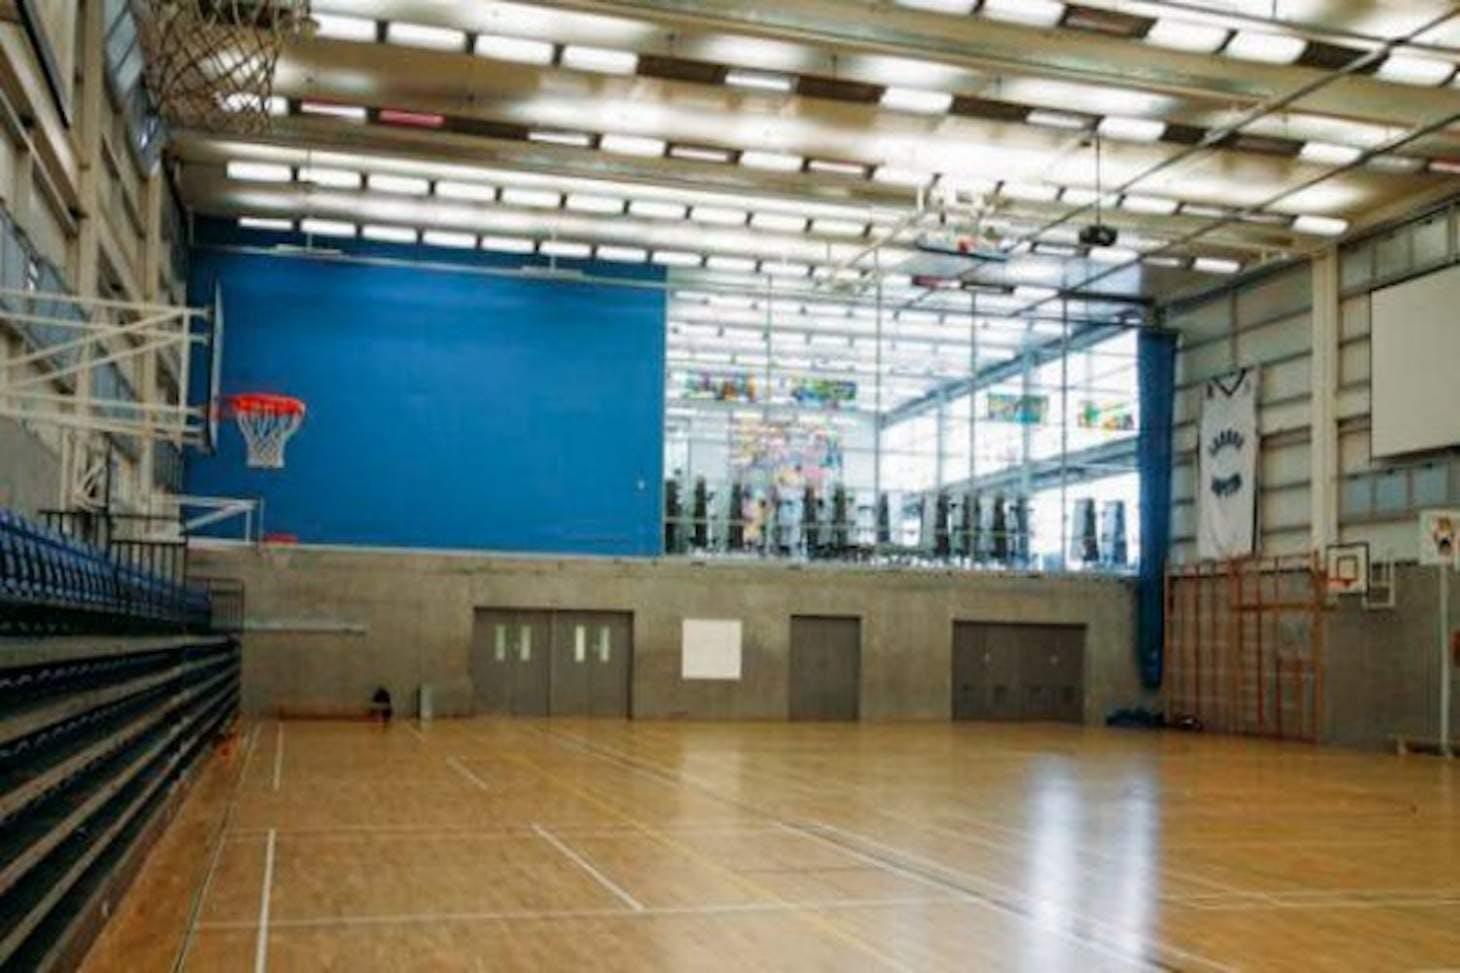 Capital City Academy Court | Sports hall basketball court